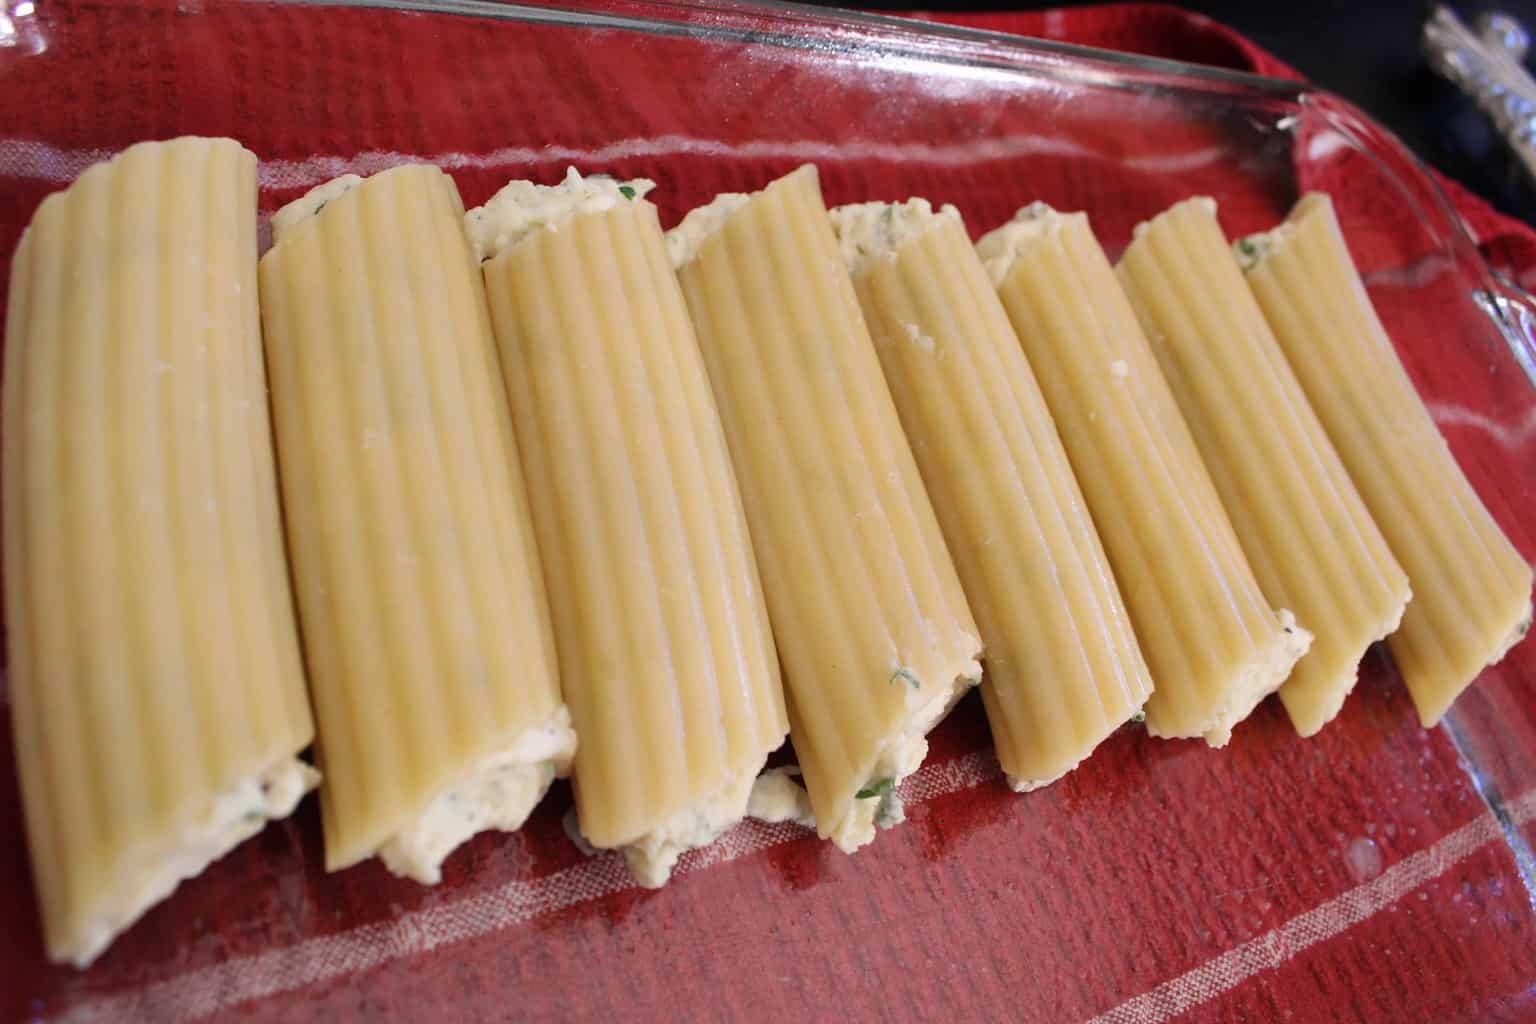 Stuffed Manicotti Pasta Shells in baking dish